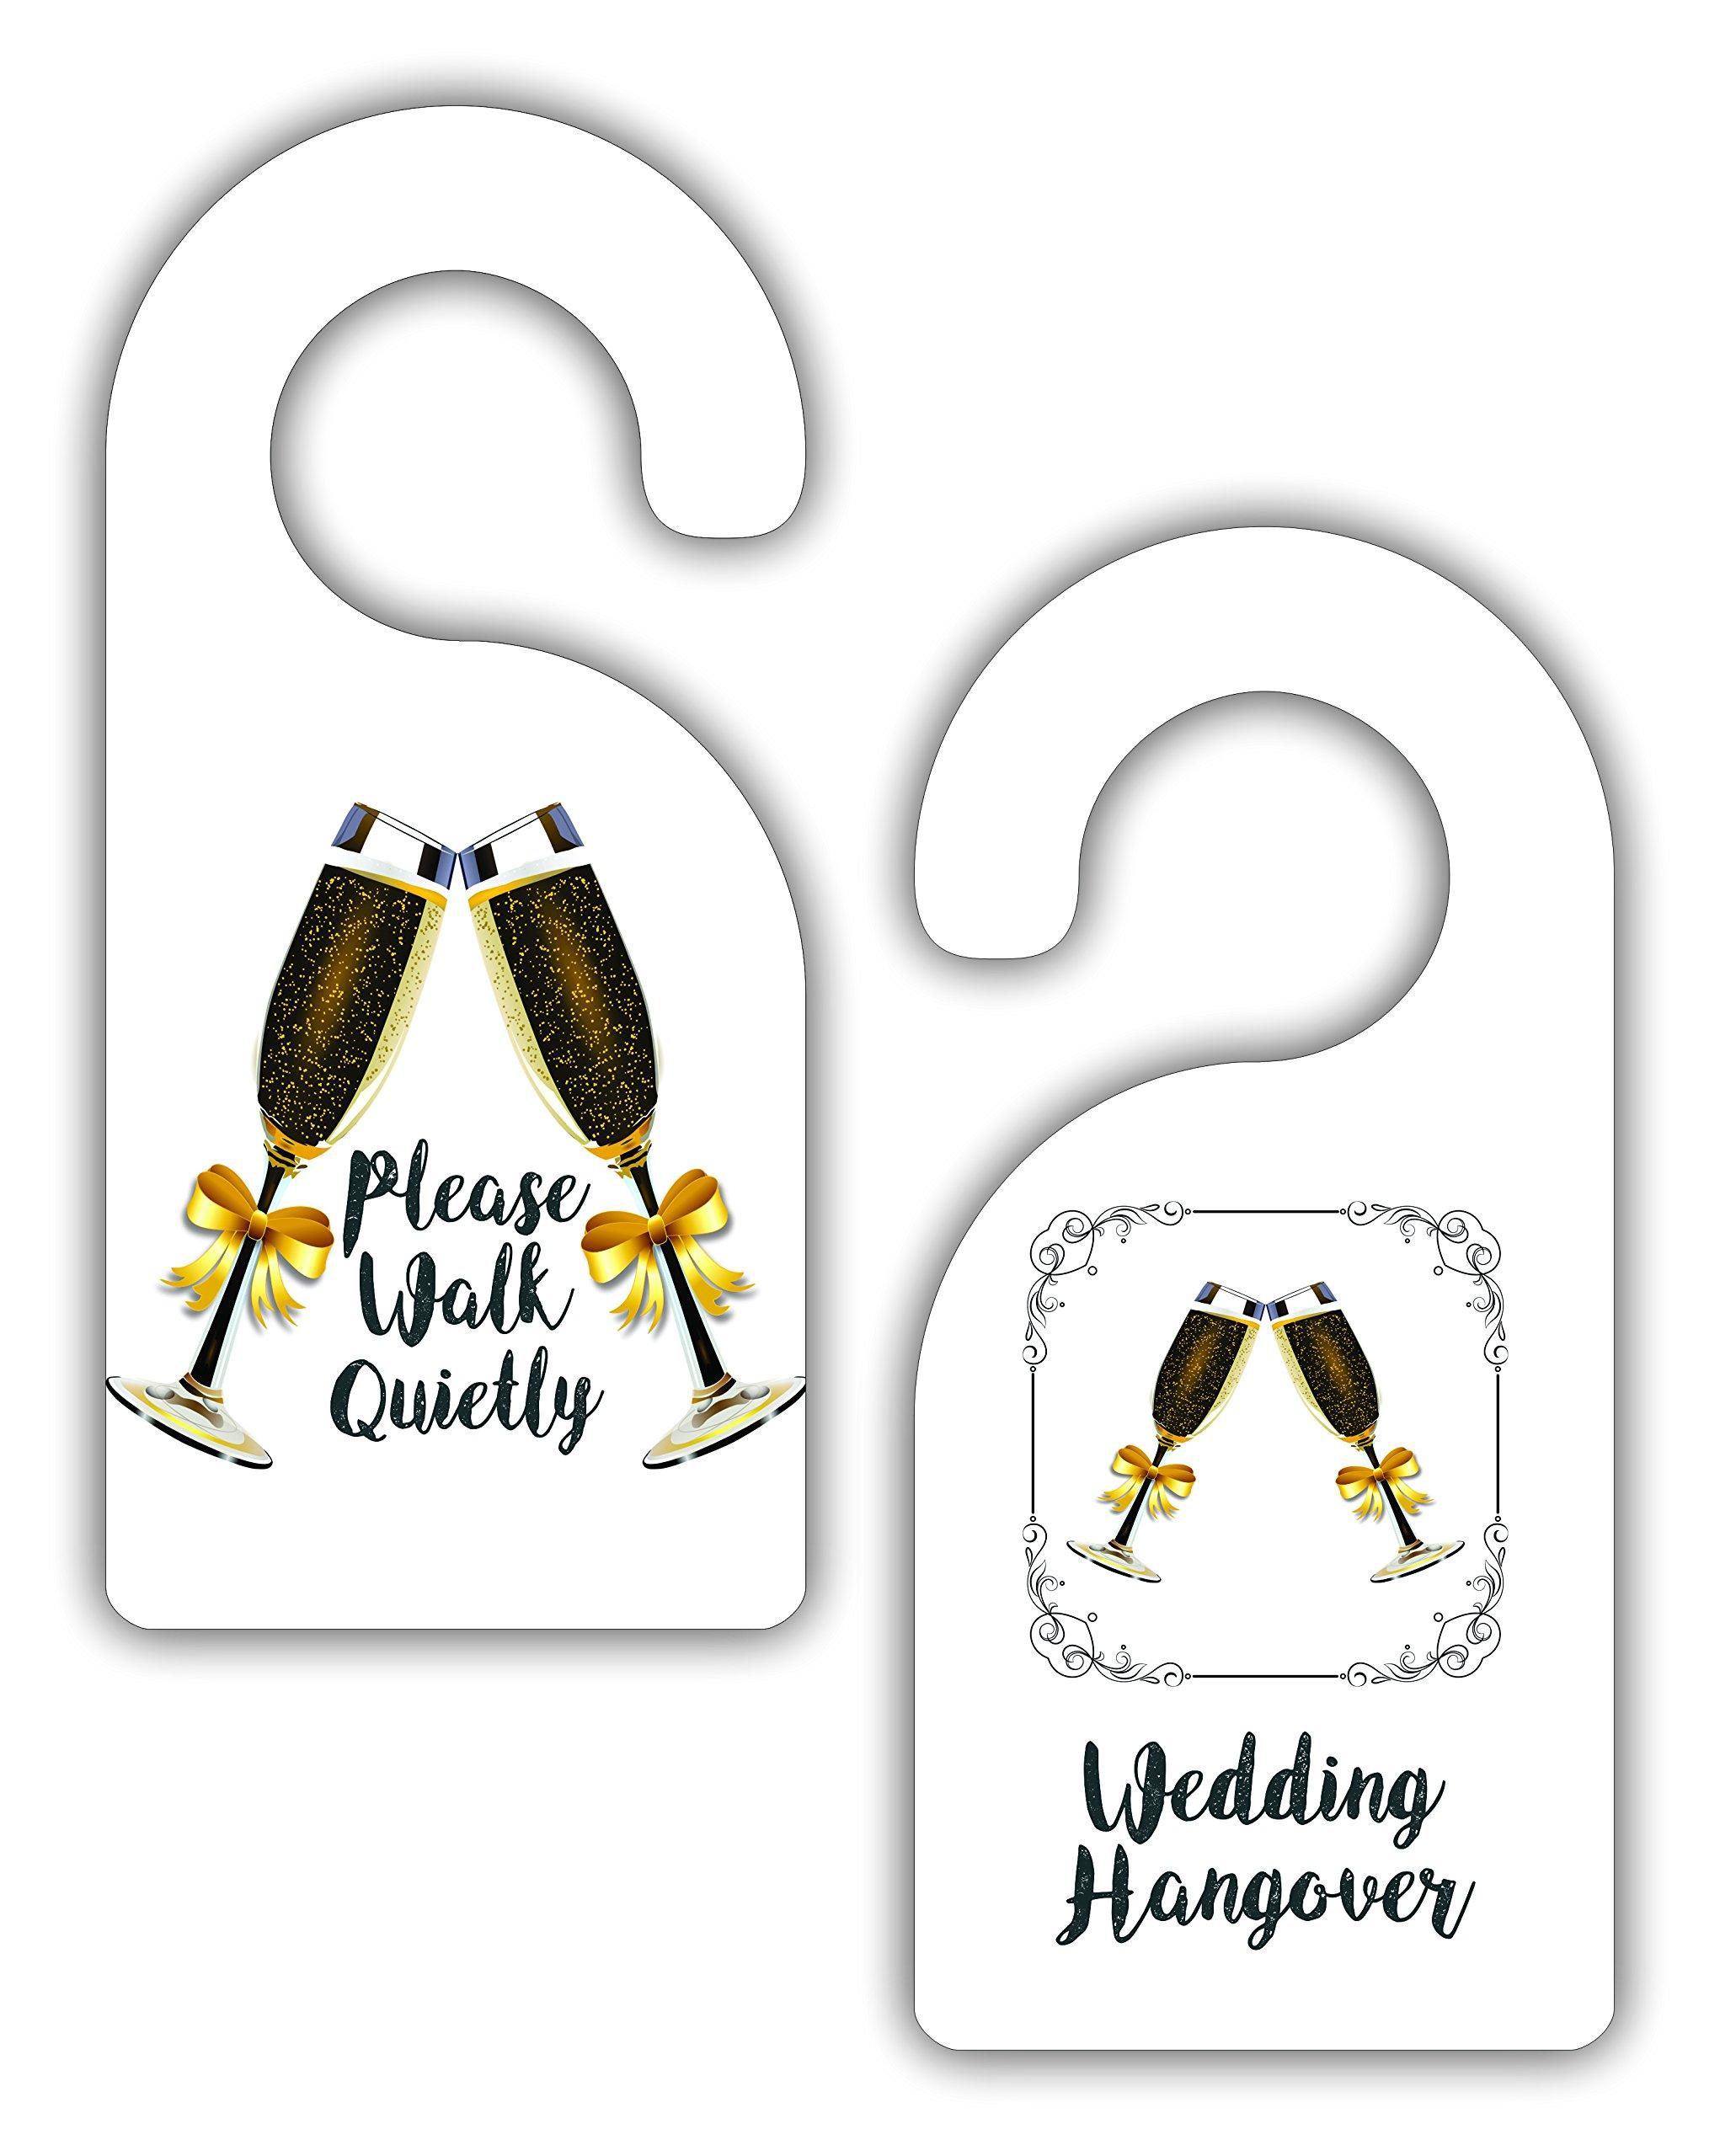 Please Walk Quietly - Wedding Hangover - Wedding Hotel / Bedroom / Room Door Sign Hanger Favor - Double Sided - Hard Plastic - Glossy Finish